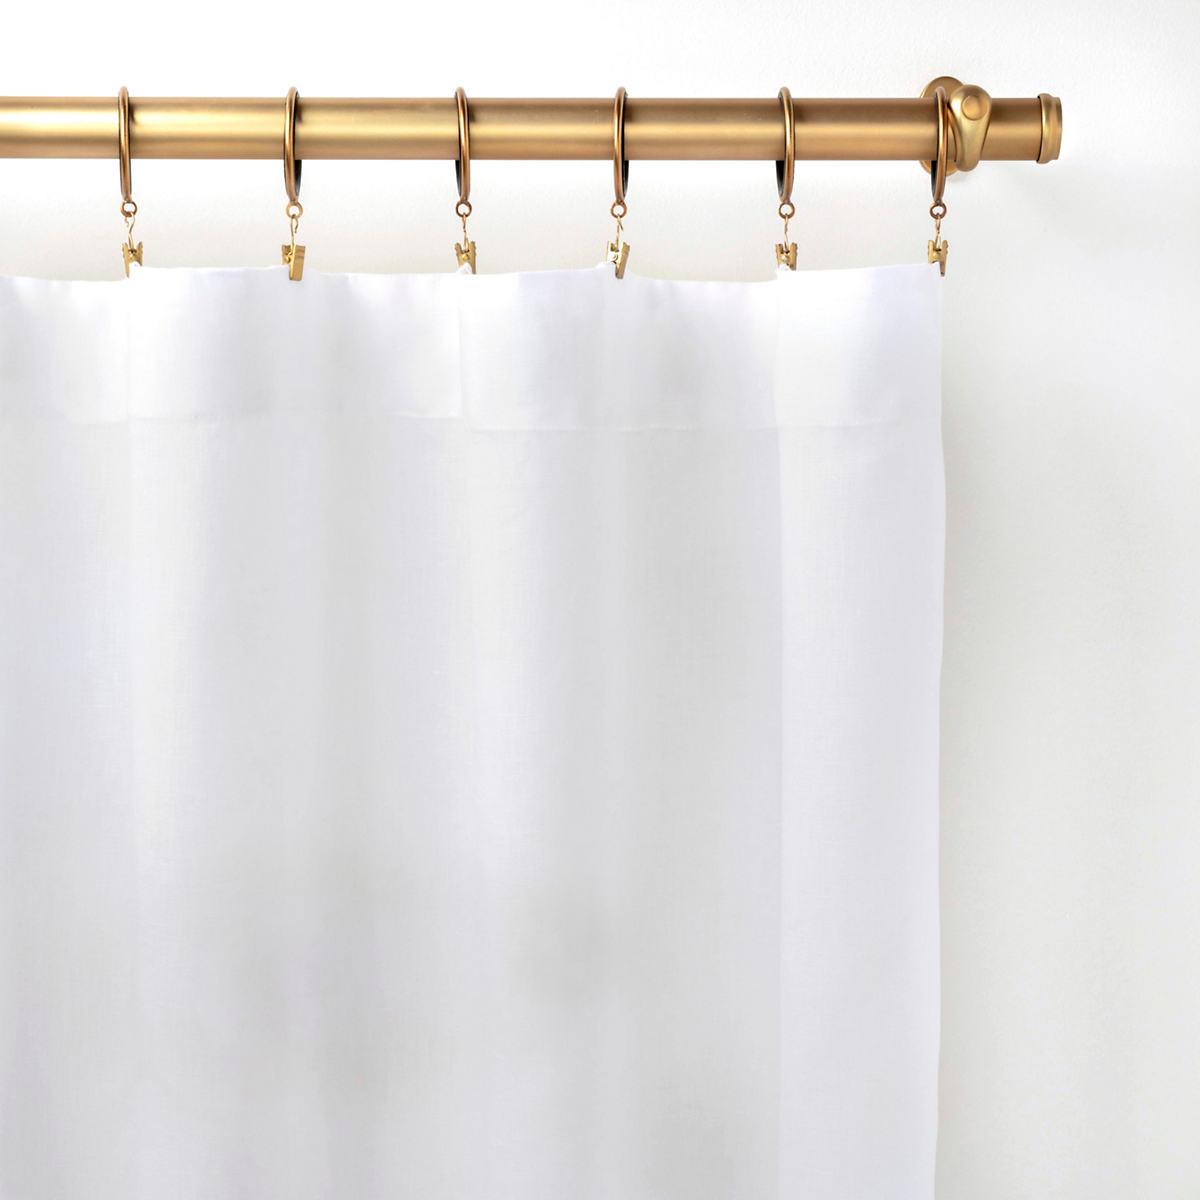 Lush Linen White Curtain Panel